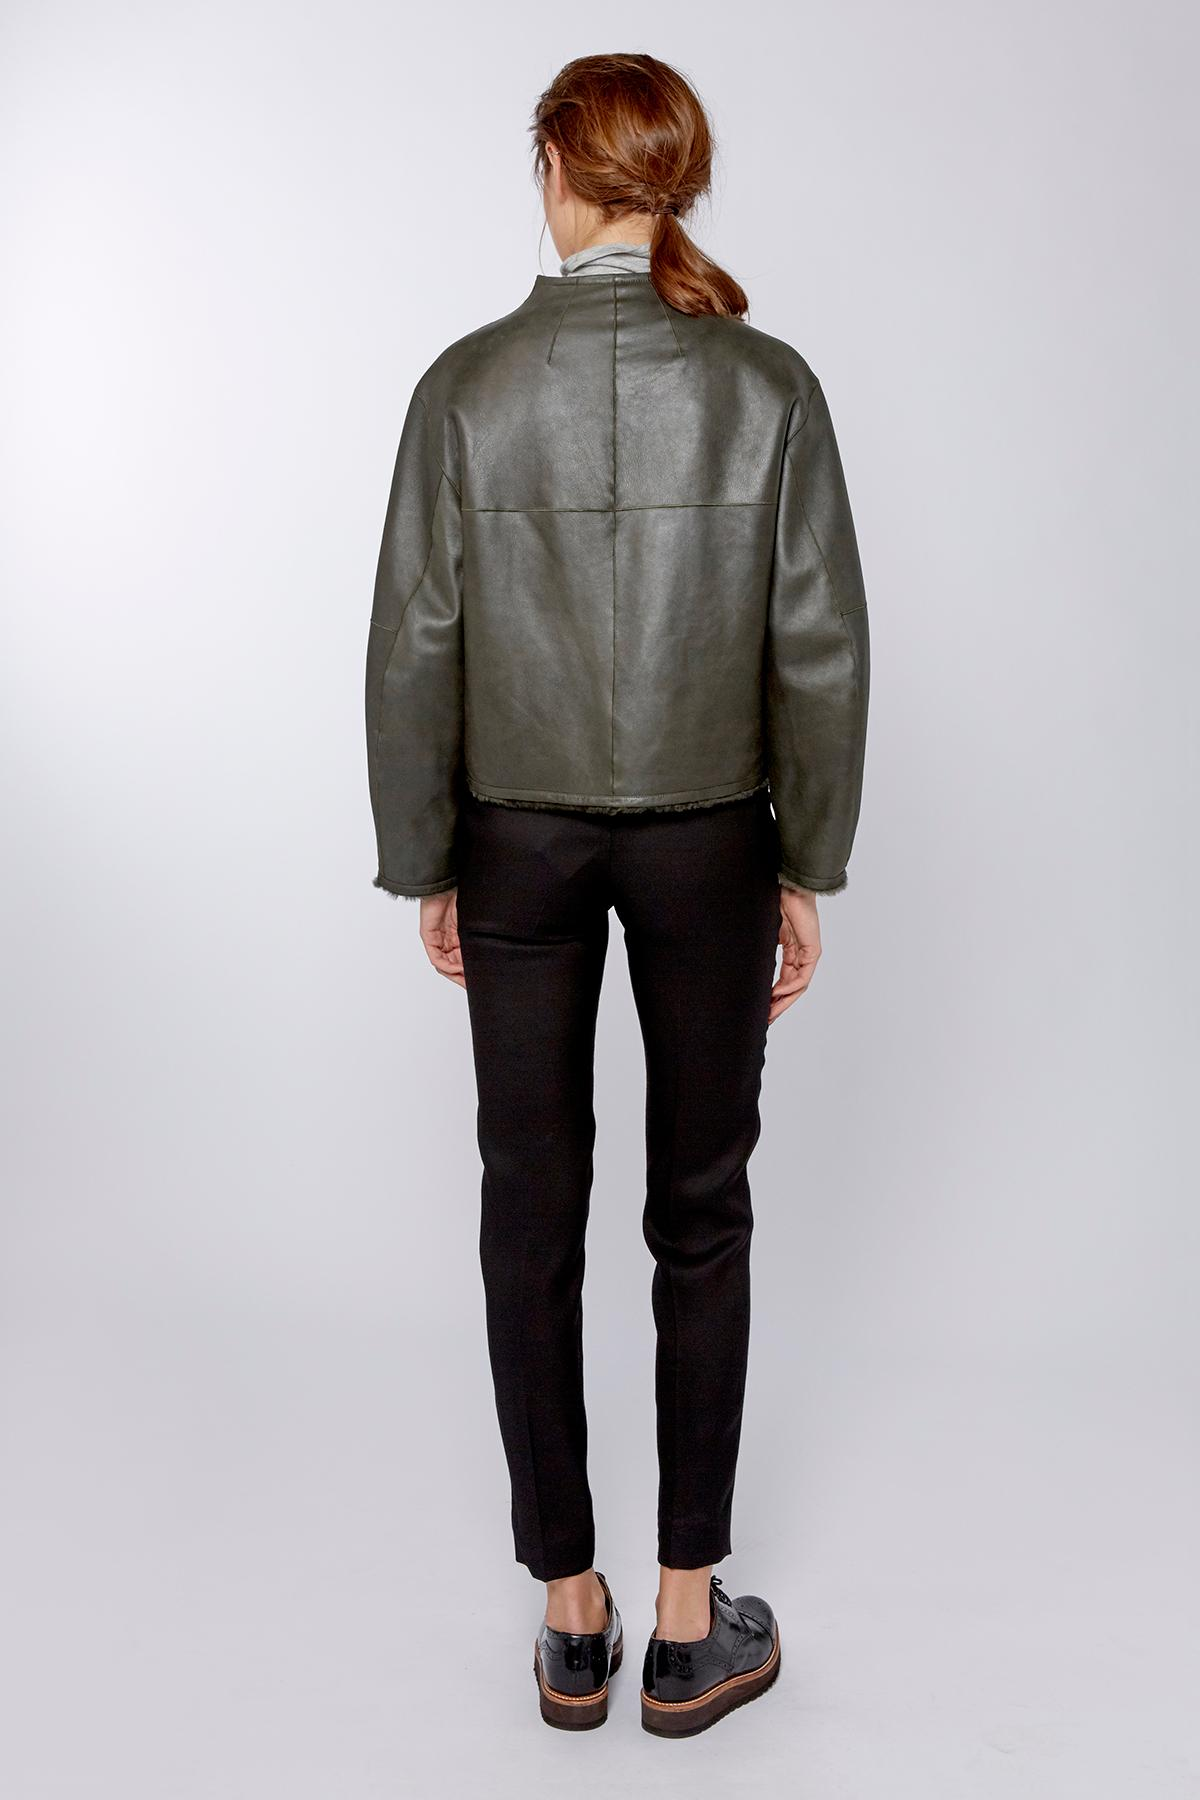 Amanda Wakeley Mirage Khaki Silky Shearling Jacket Lyst